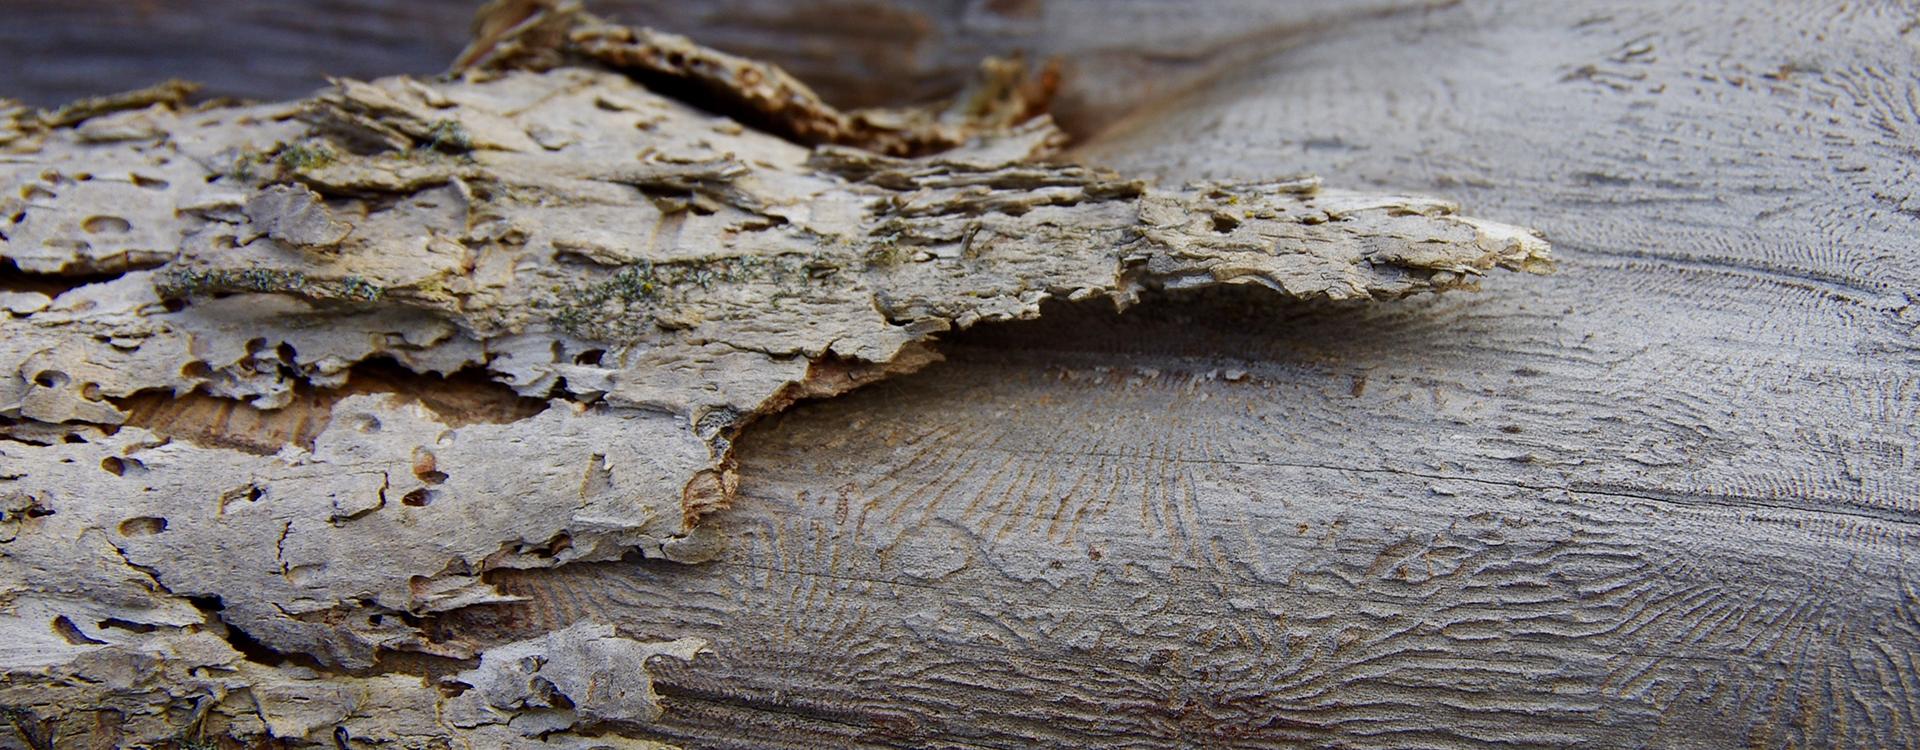 tree bark with disease